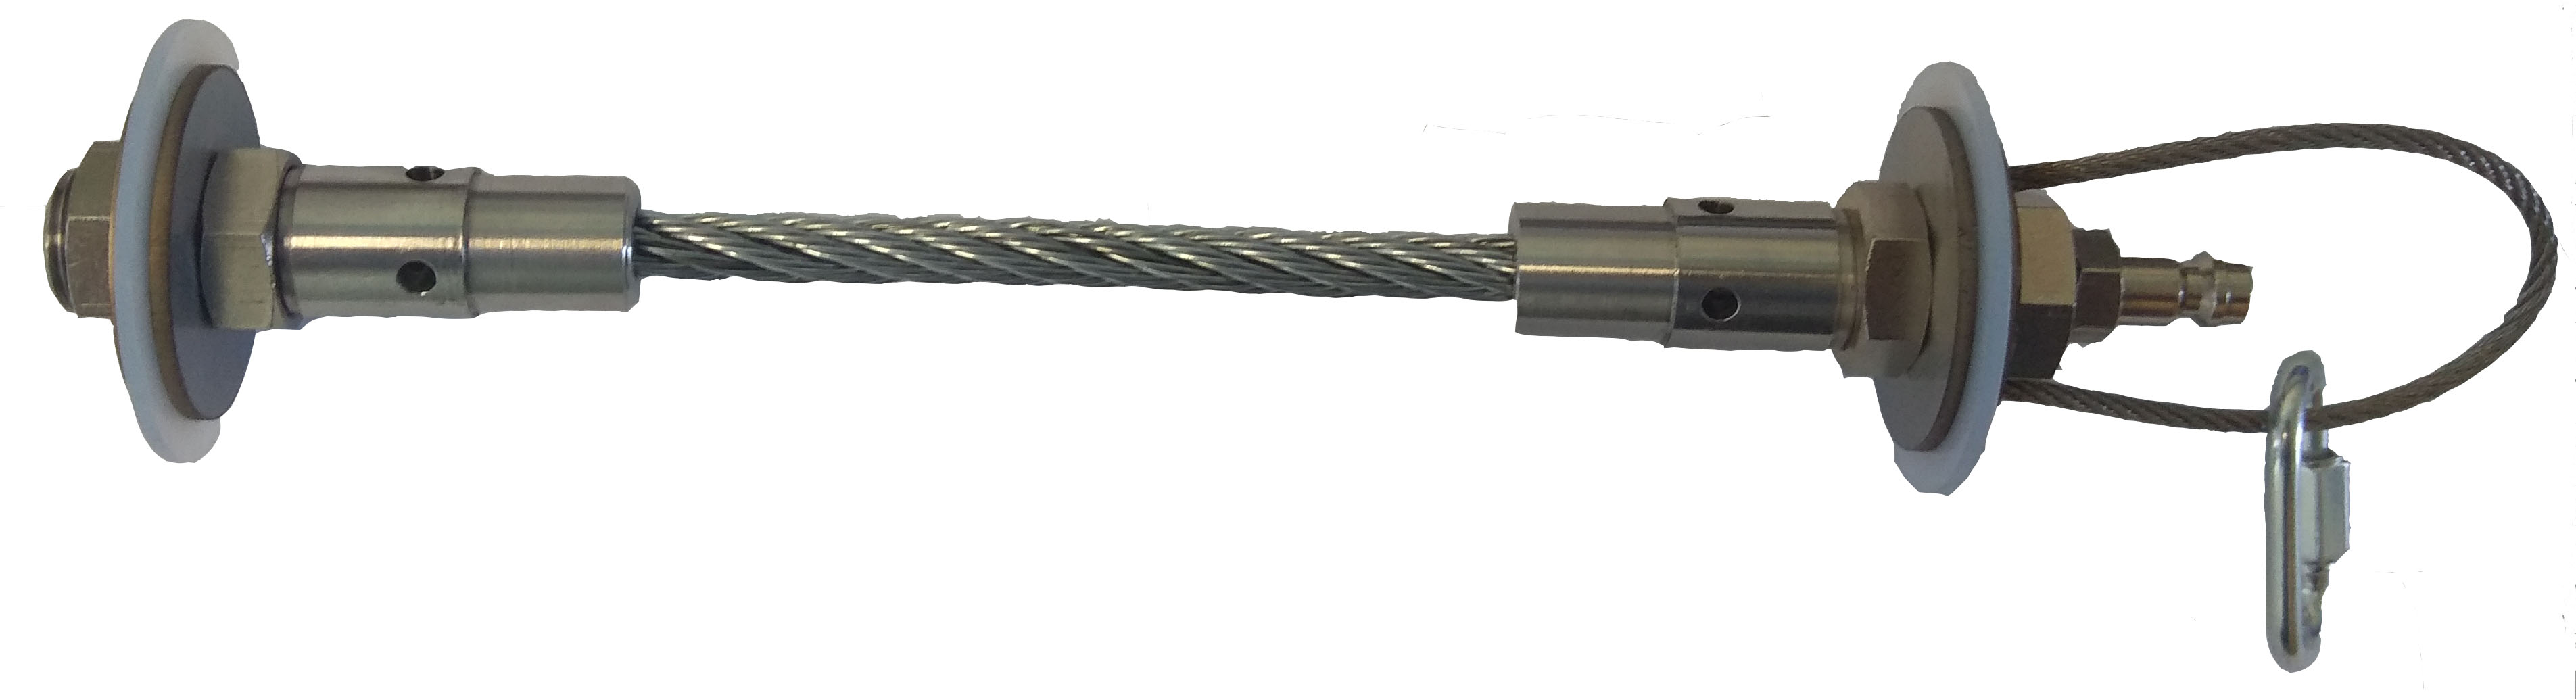 C5905